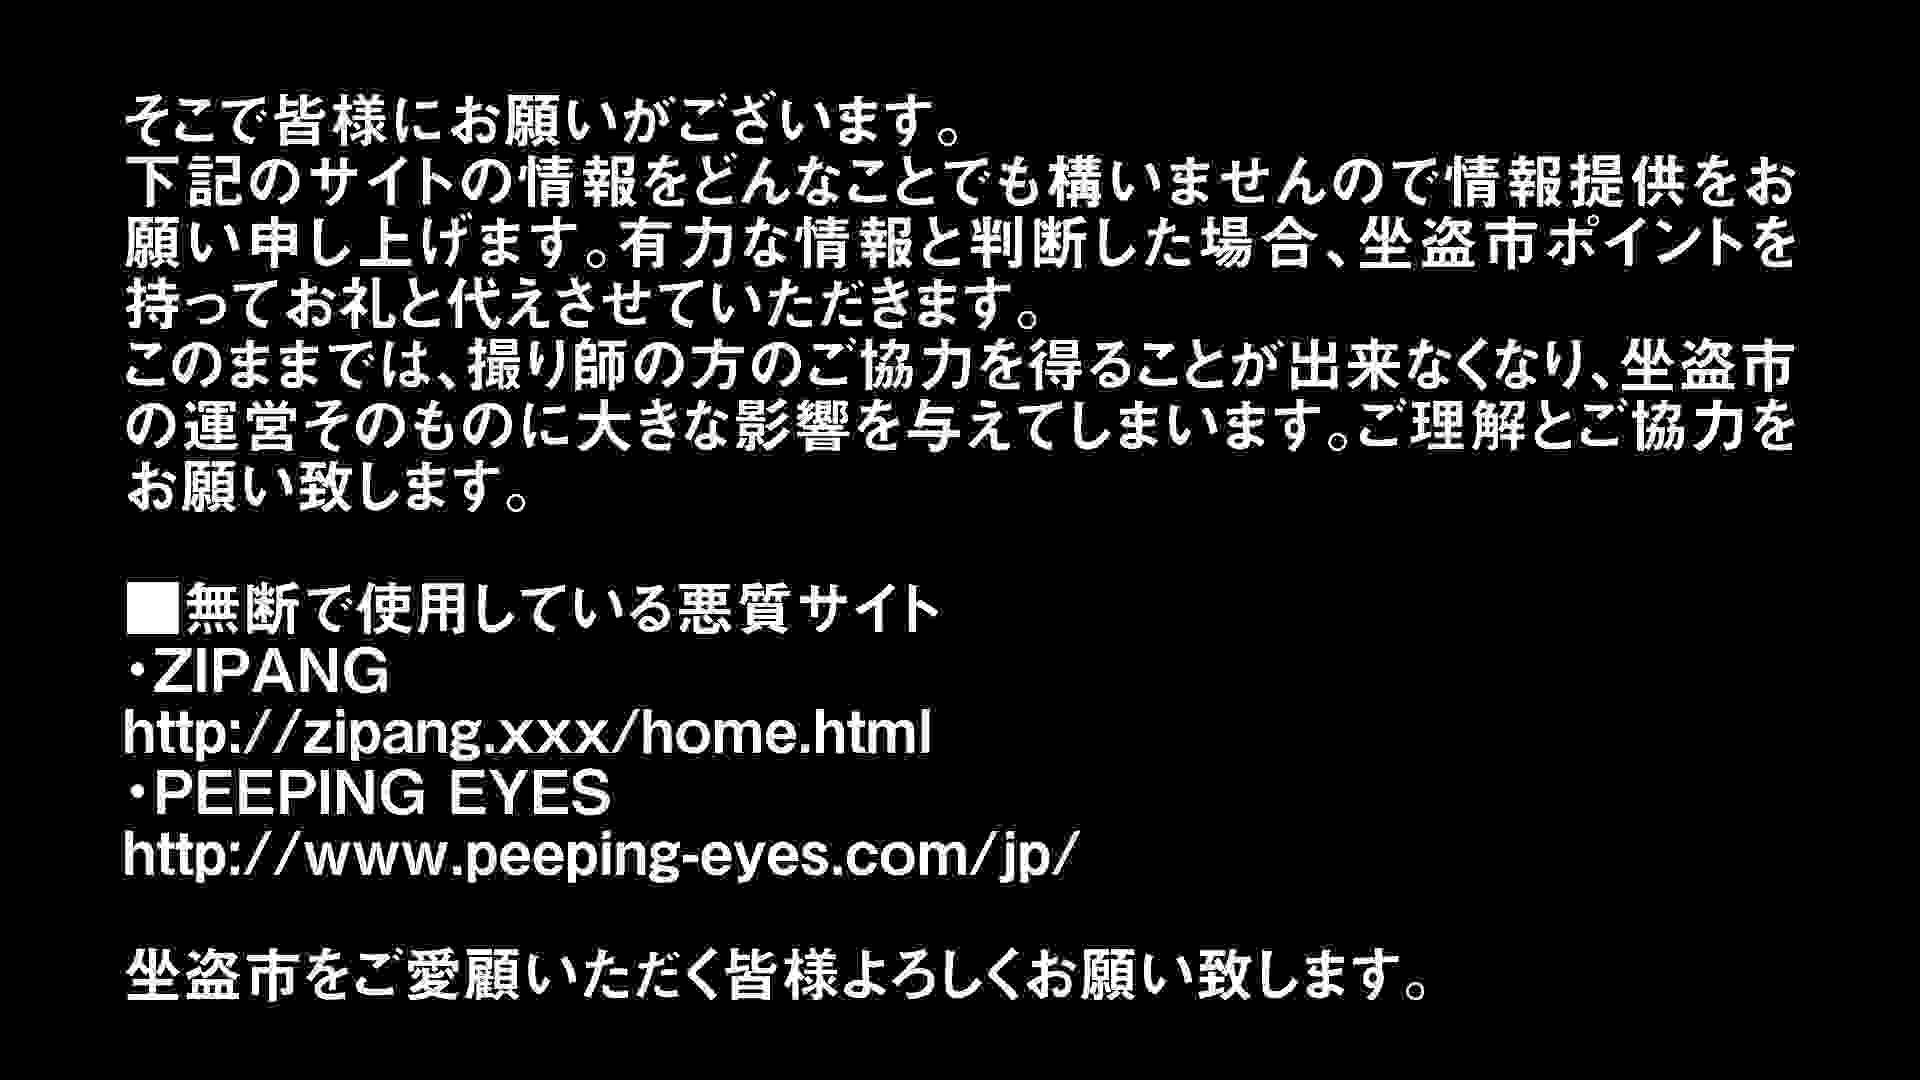 Aquaな露天風呂Vol.302 盗撮師作品  82pic 24